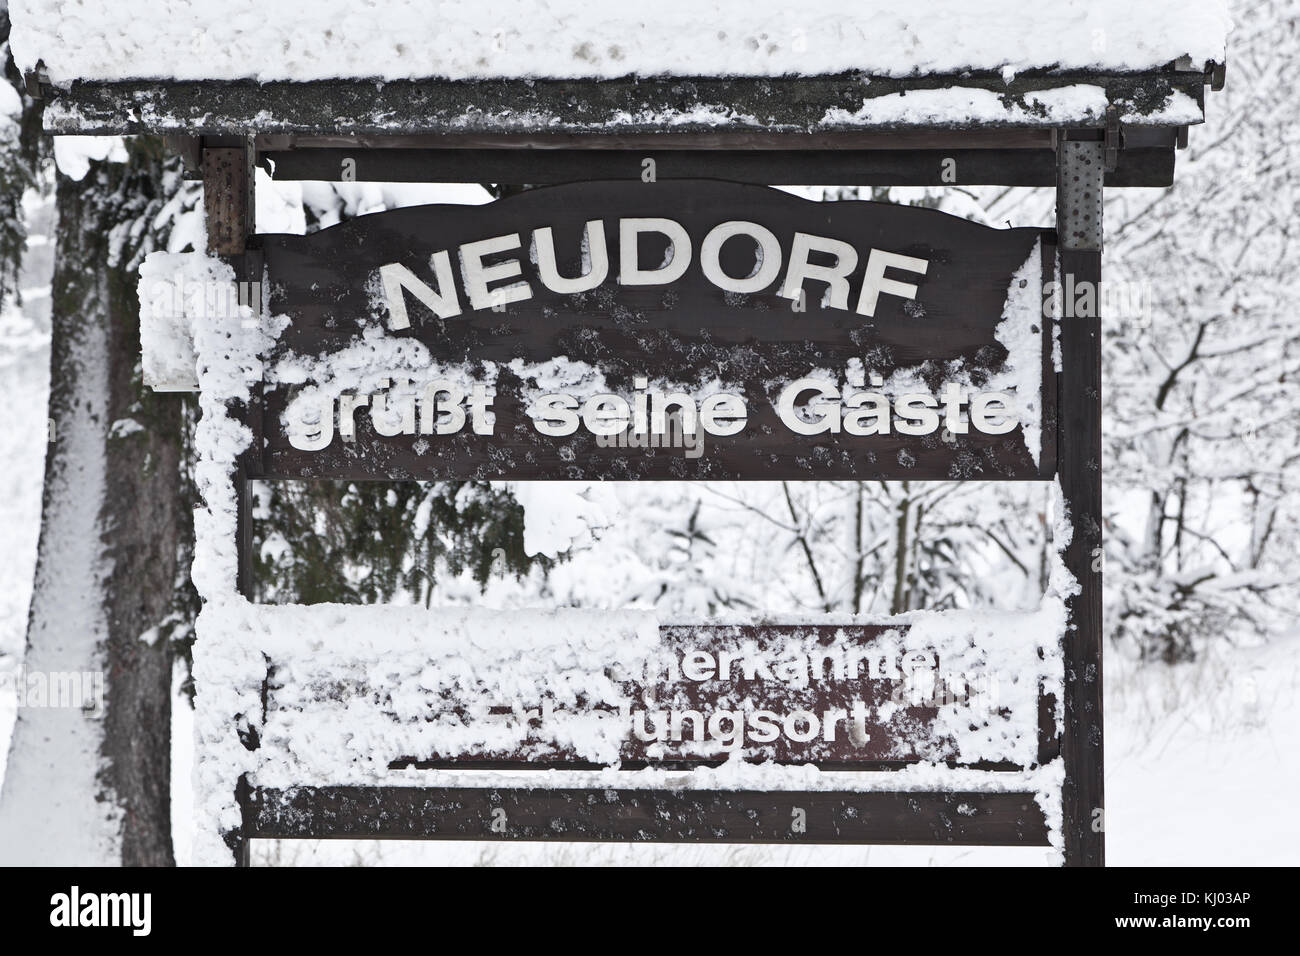 Neudorf im Harz - Stock Image